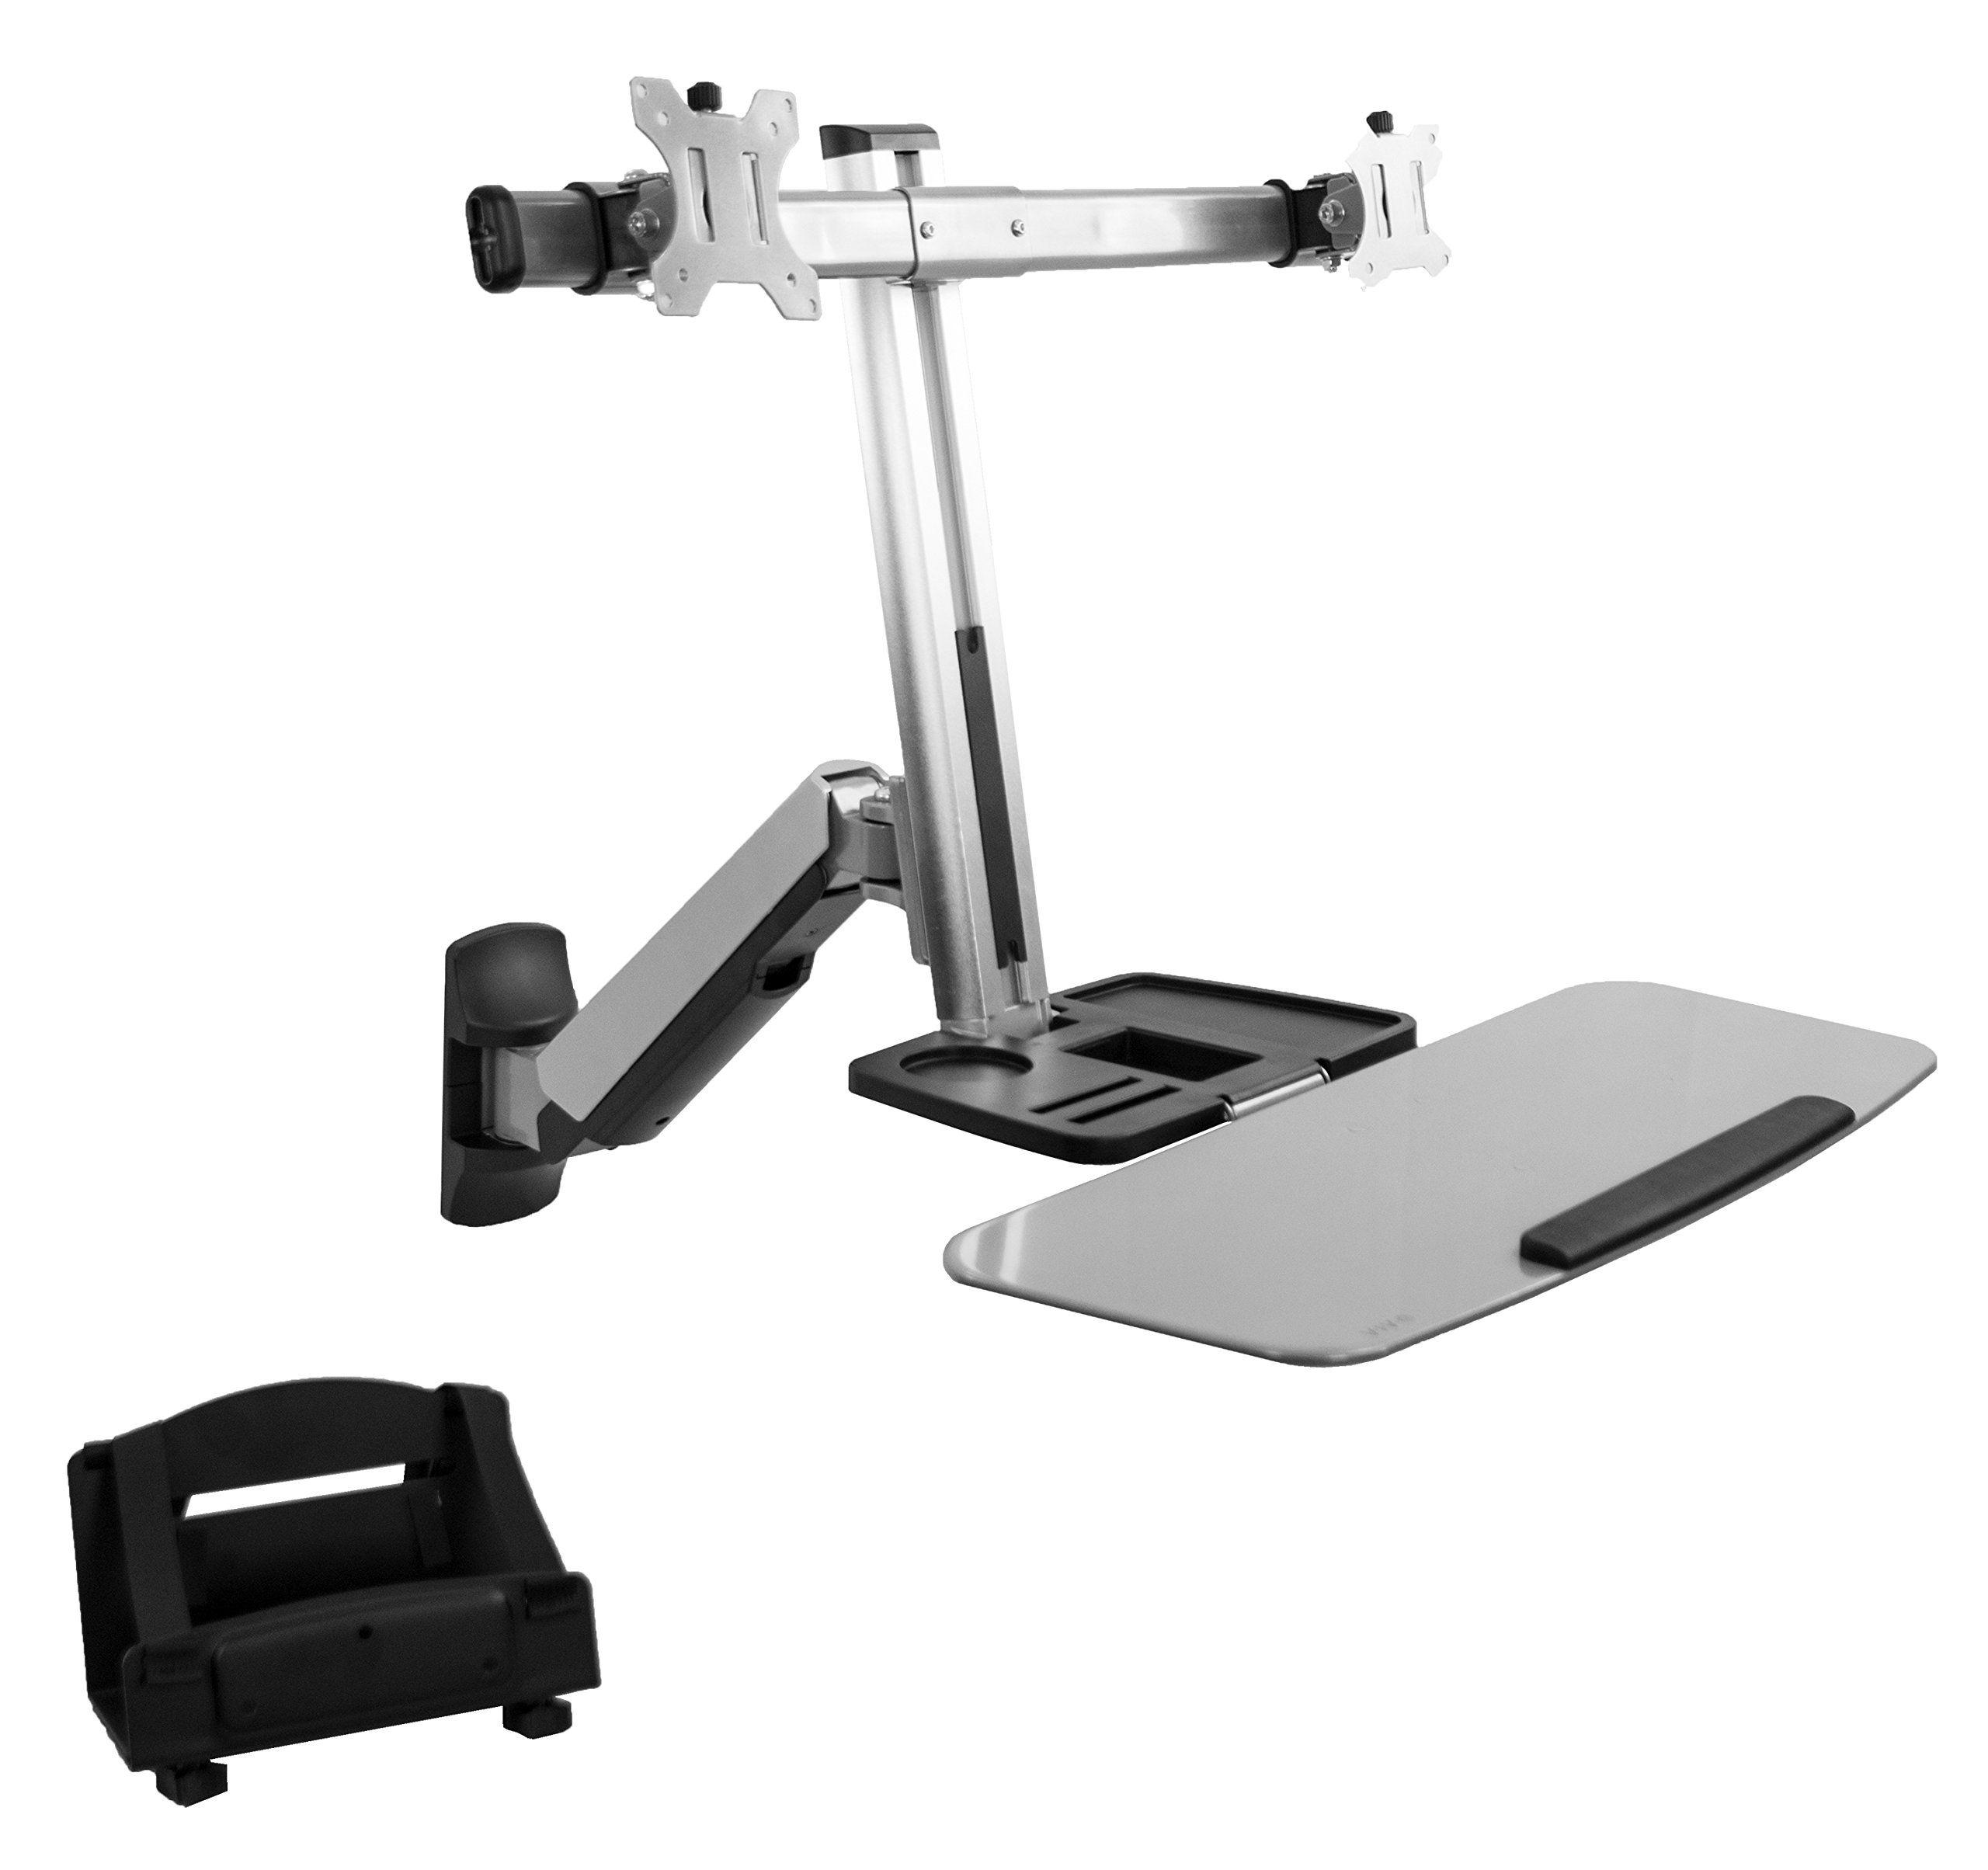 Vivo Dual Lcd Monitor Desk Mount Stand